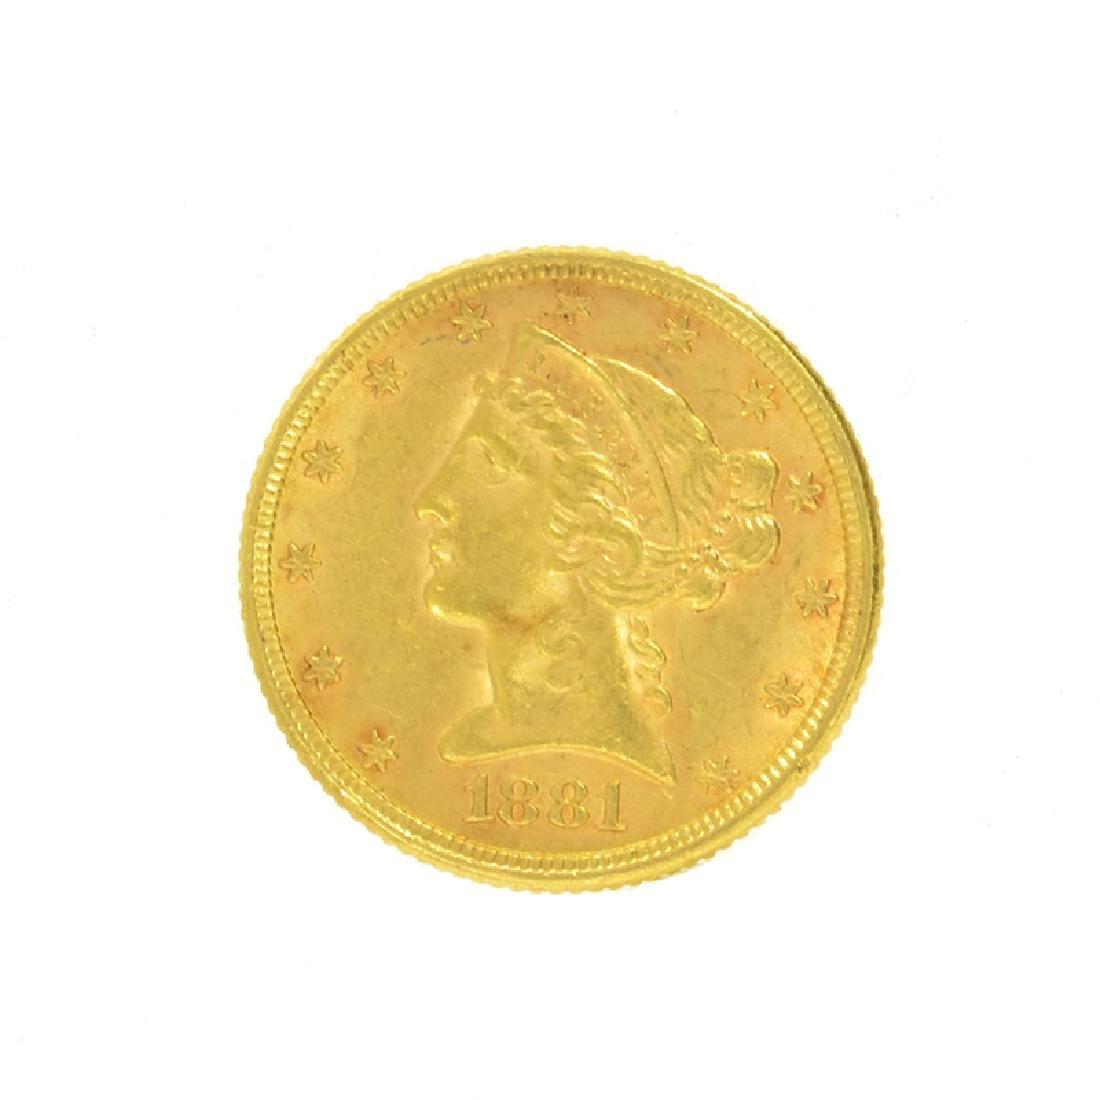 *1881 $5 U.S. Liberty Head Gold Coin (DF)